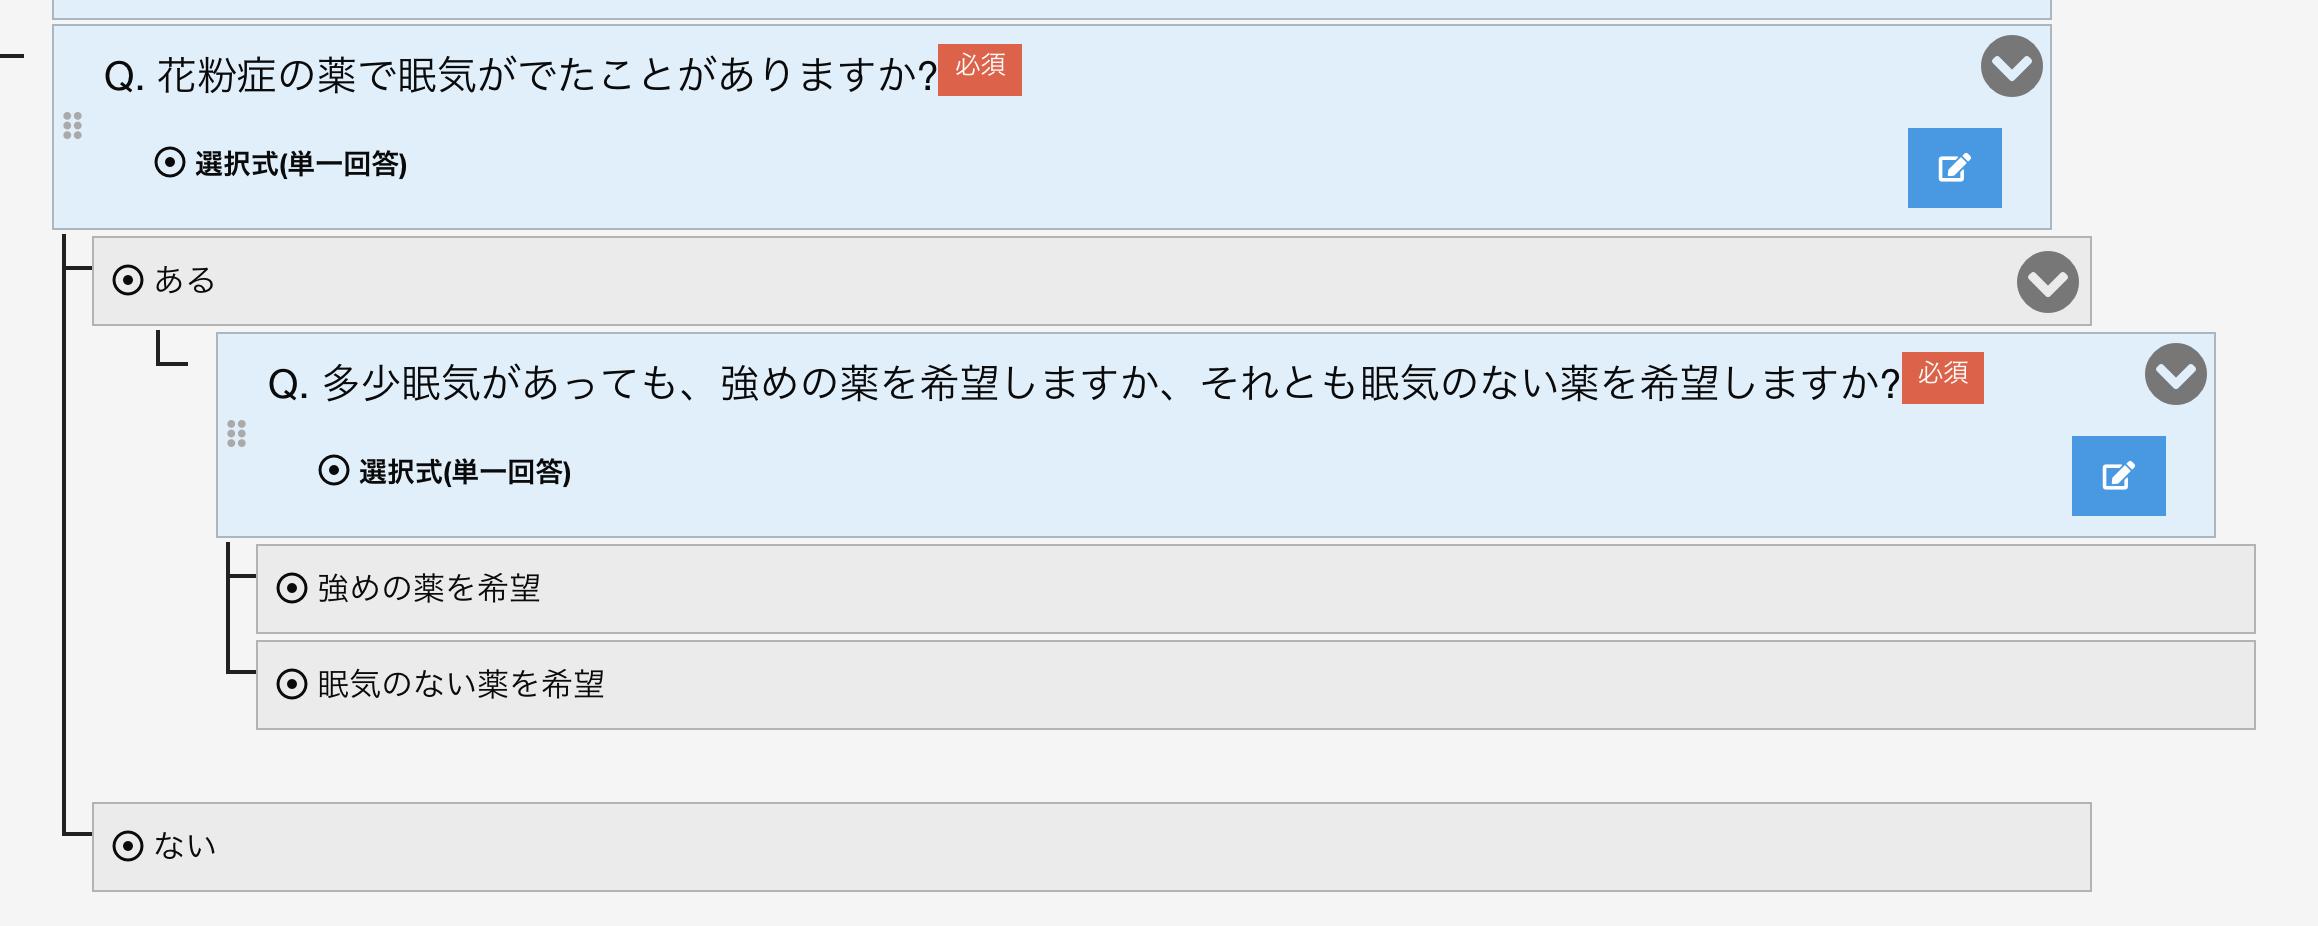 suido-hihu-monshin12